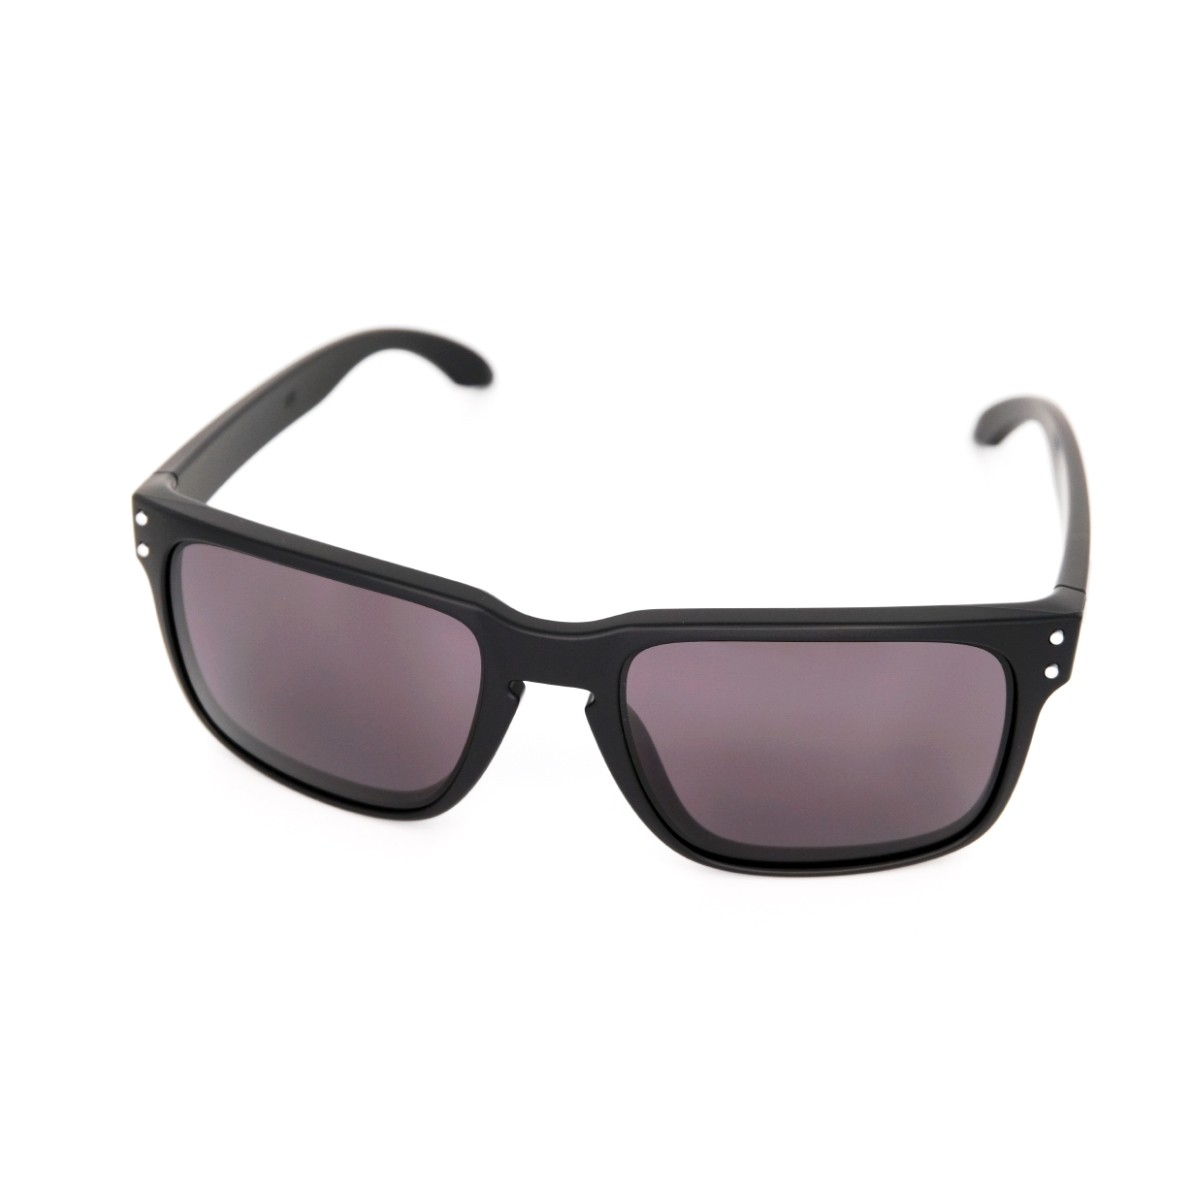 Oakley Holbrook 9102-01, 84,00€, Occhiali Oakley Nero a forma Rettangolare